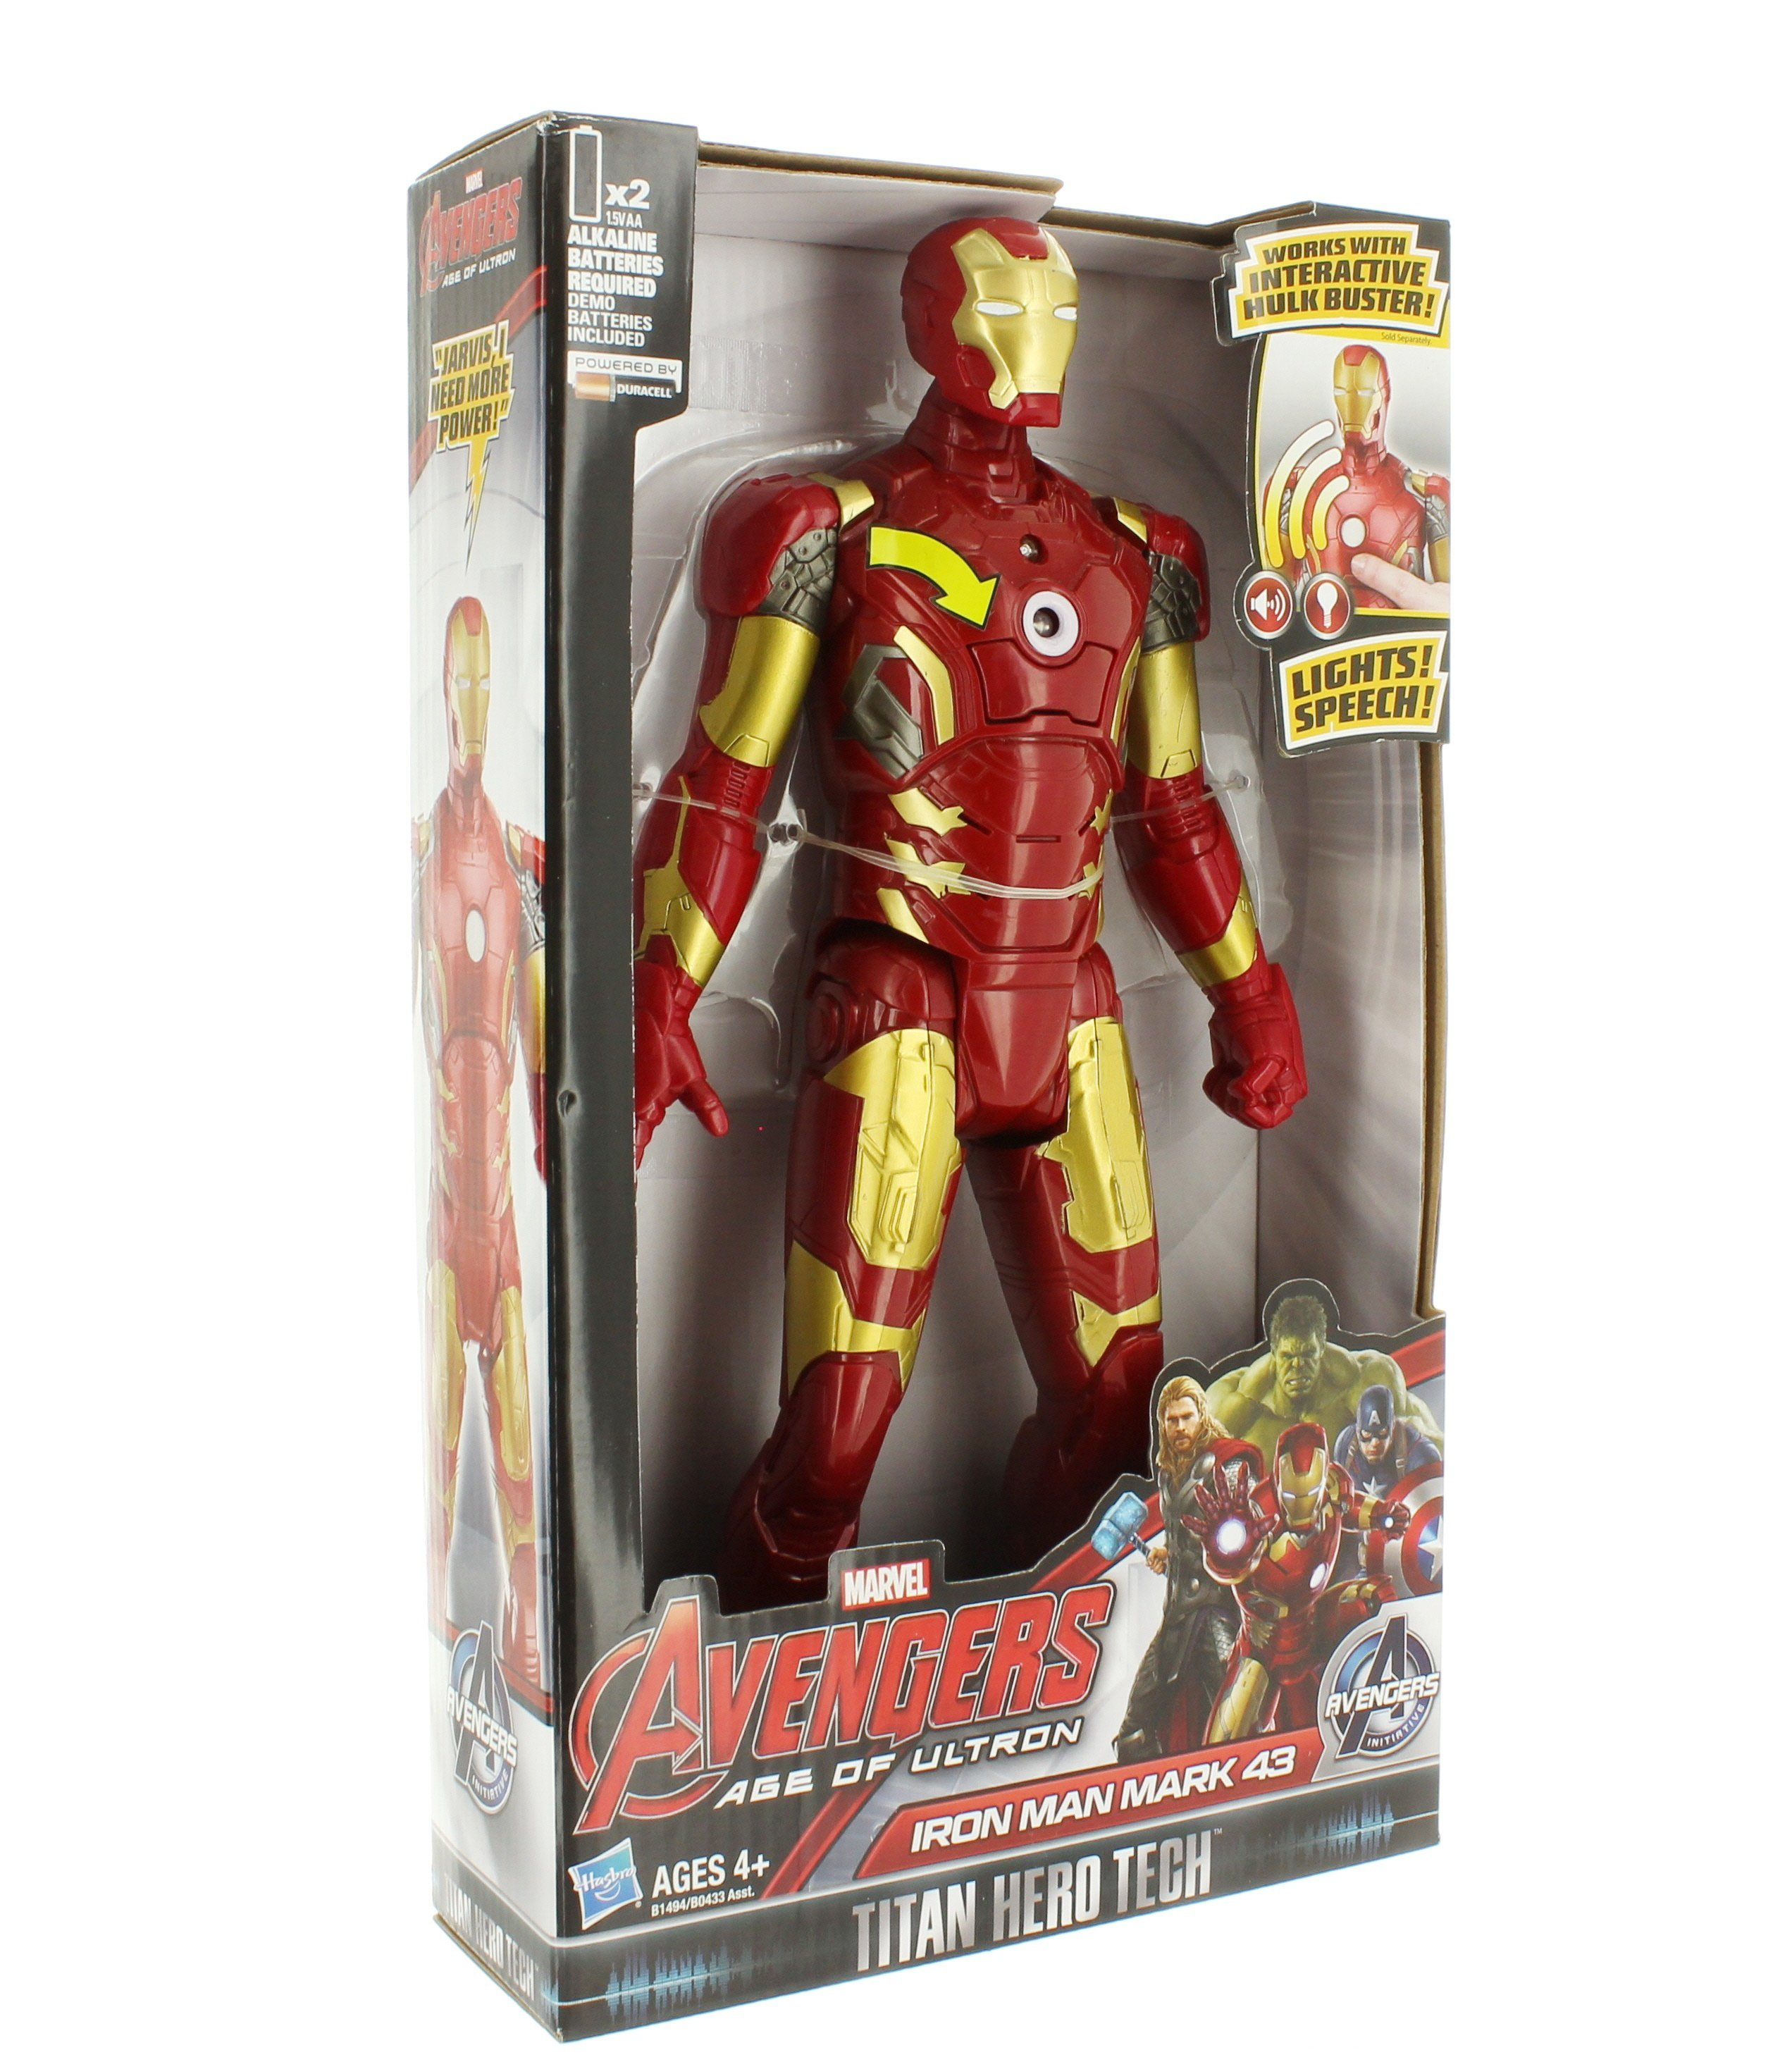 Hasbro Avengers Titan Hero Tech Thor Age of Ultron Electronic Sound Figure Toy